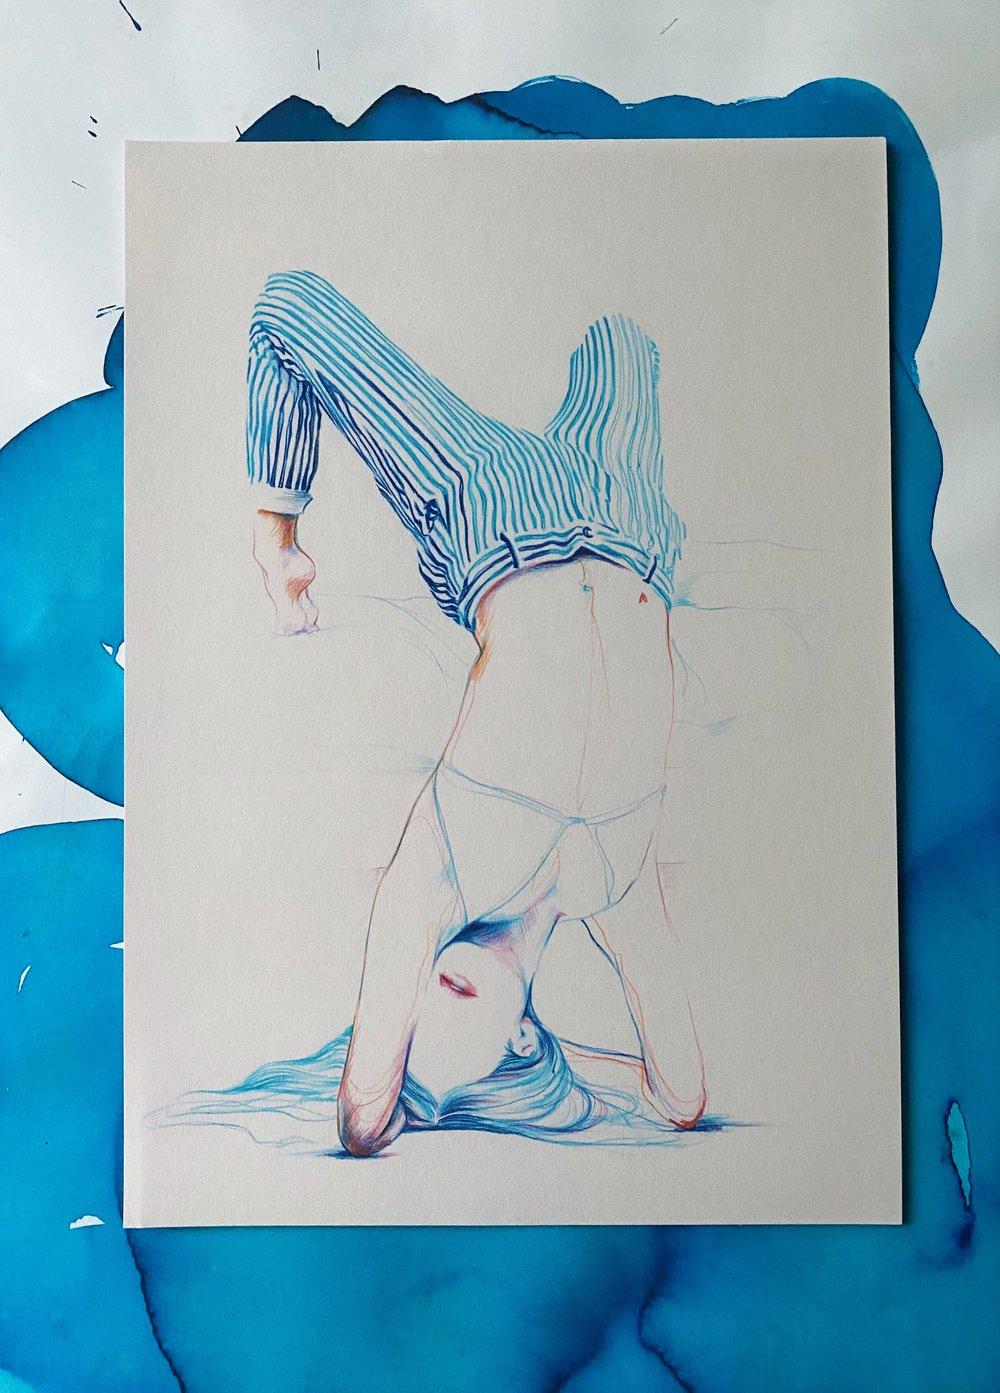 Image of Stretch pt 1